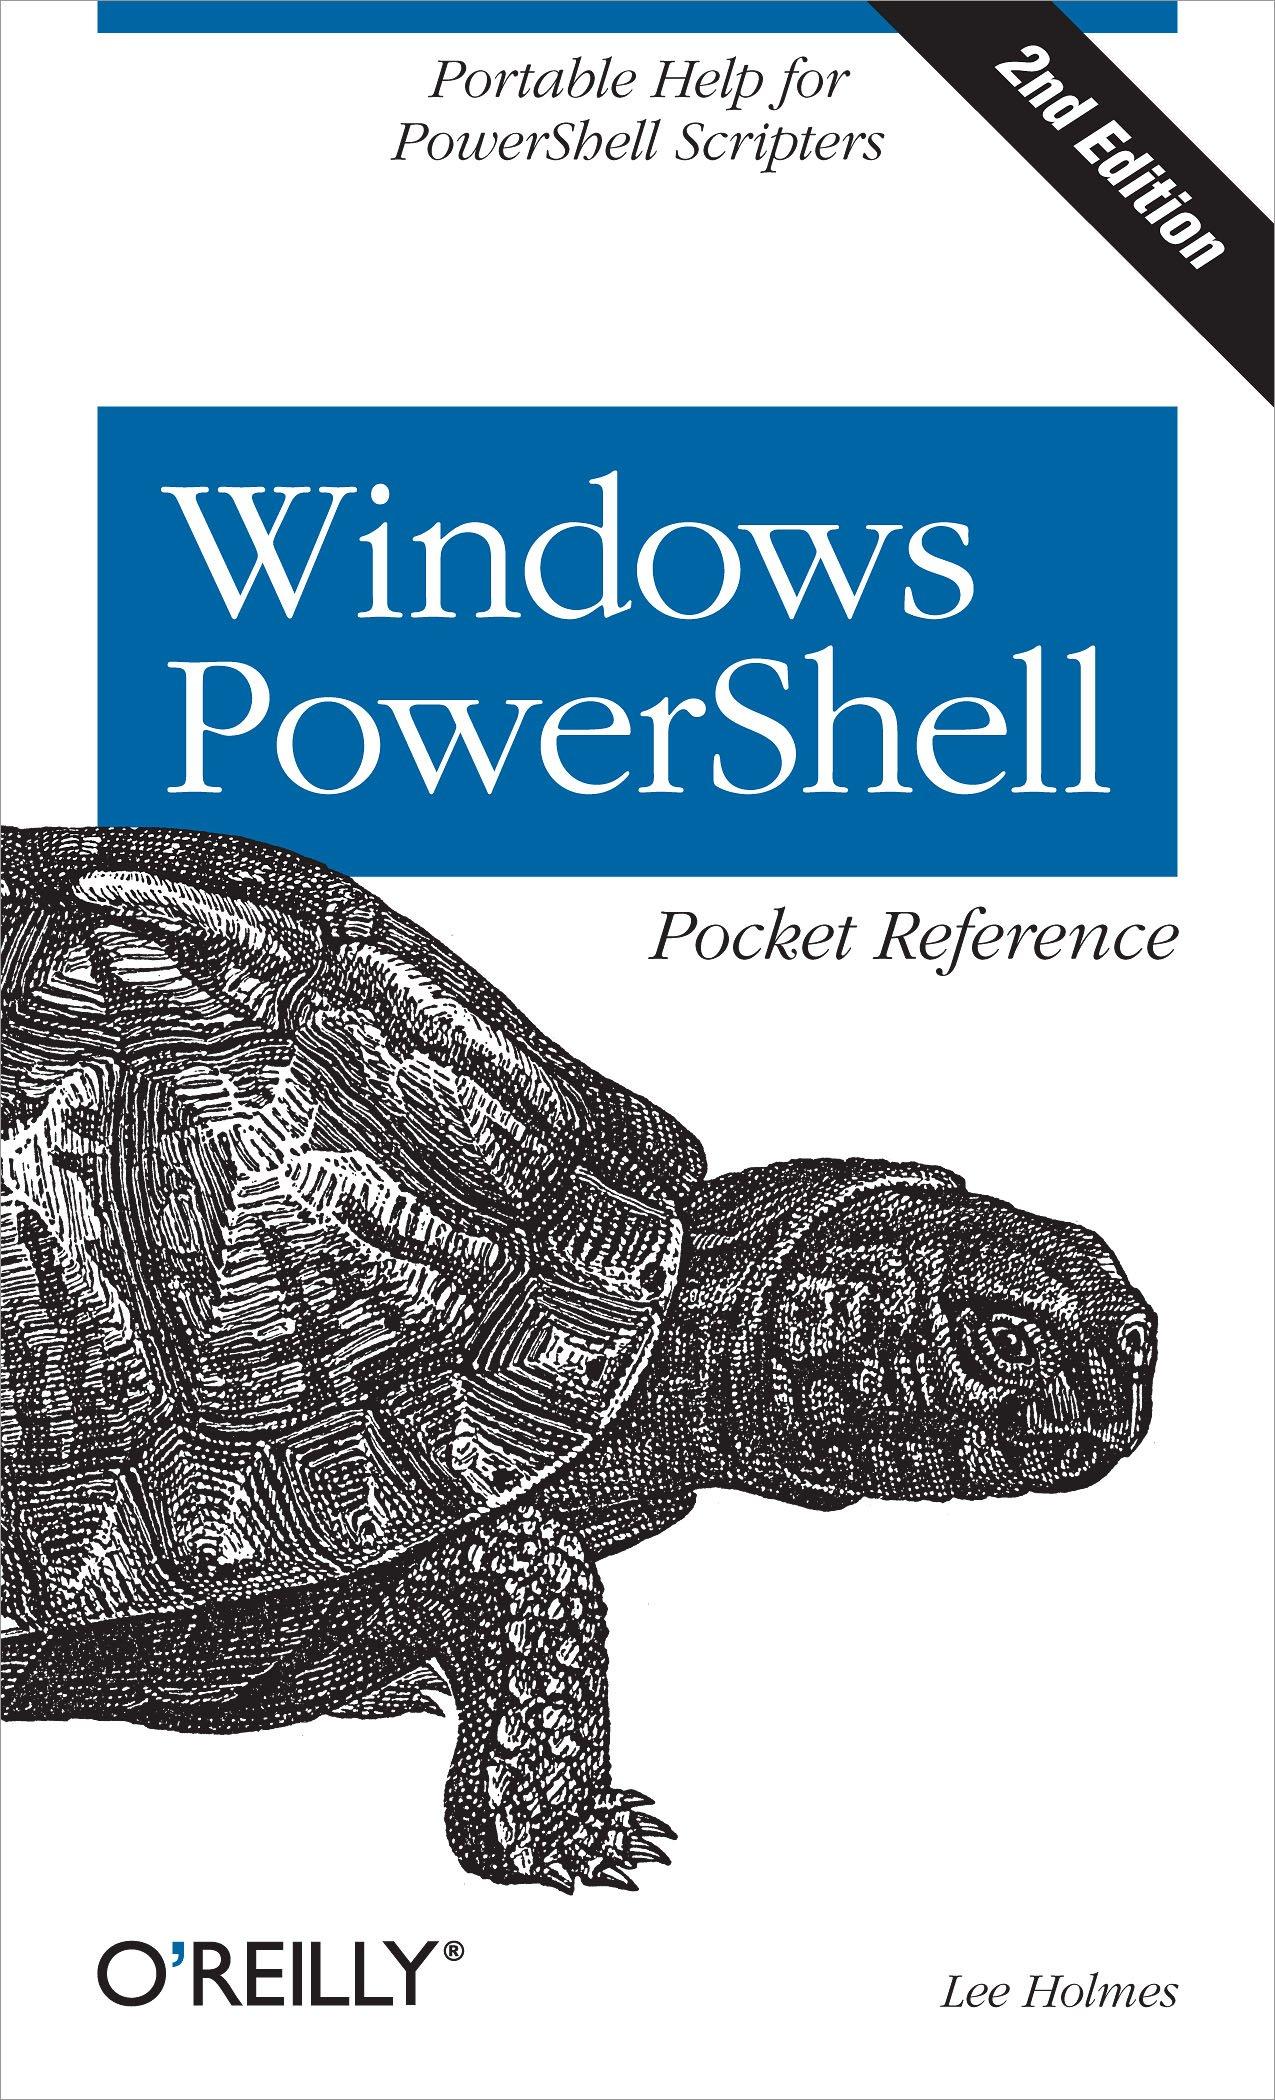 Windows PowerShell Pocket Reference: Portable Help for PowerShell Scripters (Pocket Reference (O'Reilly)) (English Edition)